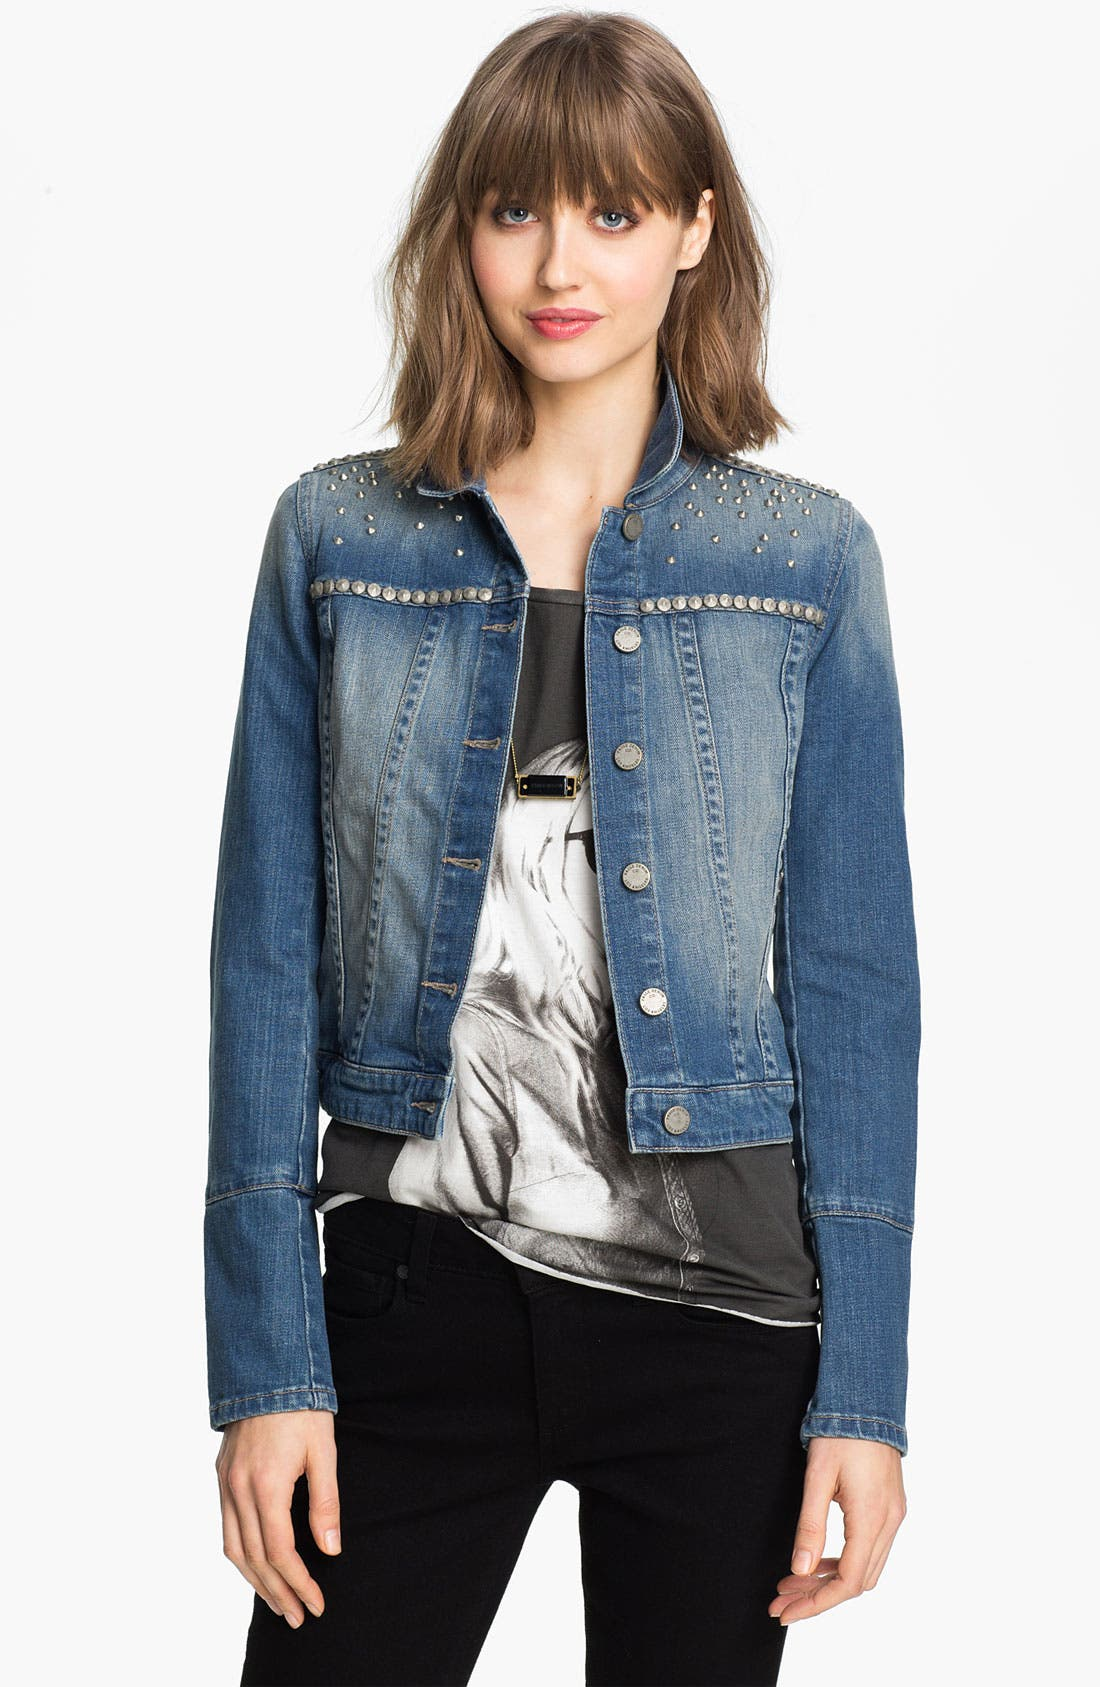 Alternate Image 1 Selected - Paige Denim 'Colbie' Studded Denim Jacket